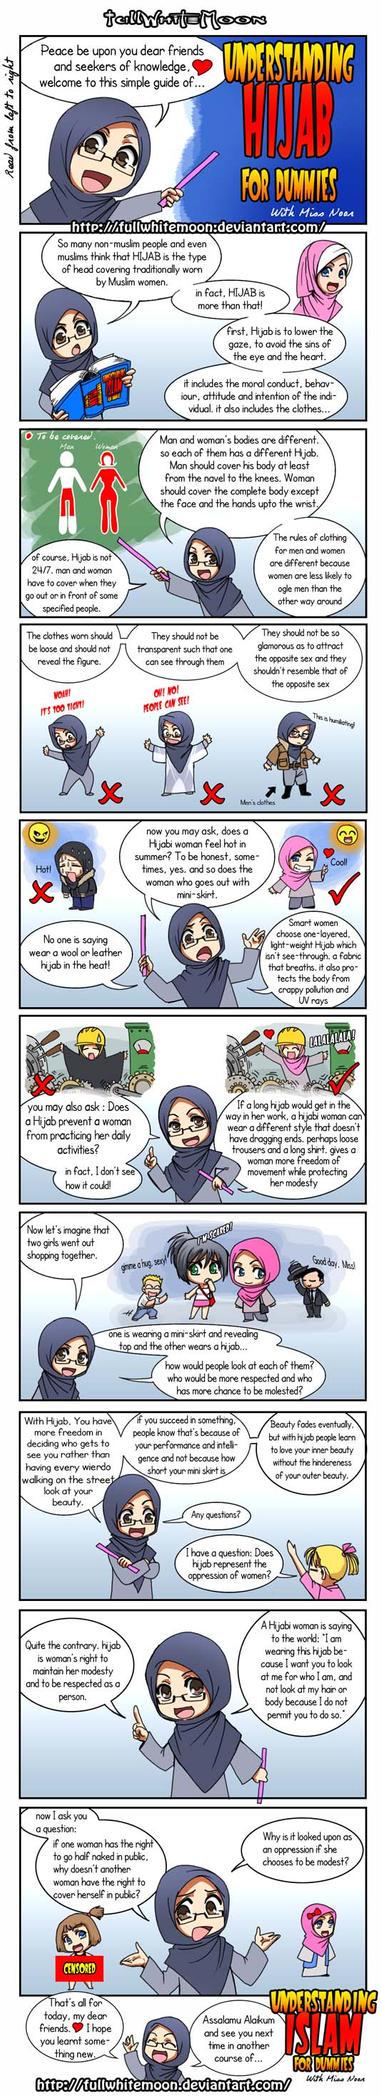 Understanding Hijab 4 dummies by FullWhiteMoon